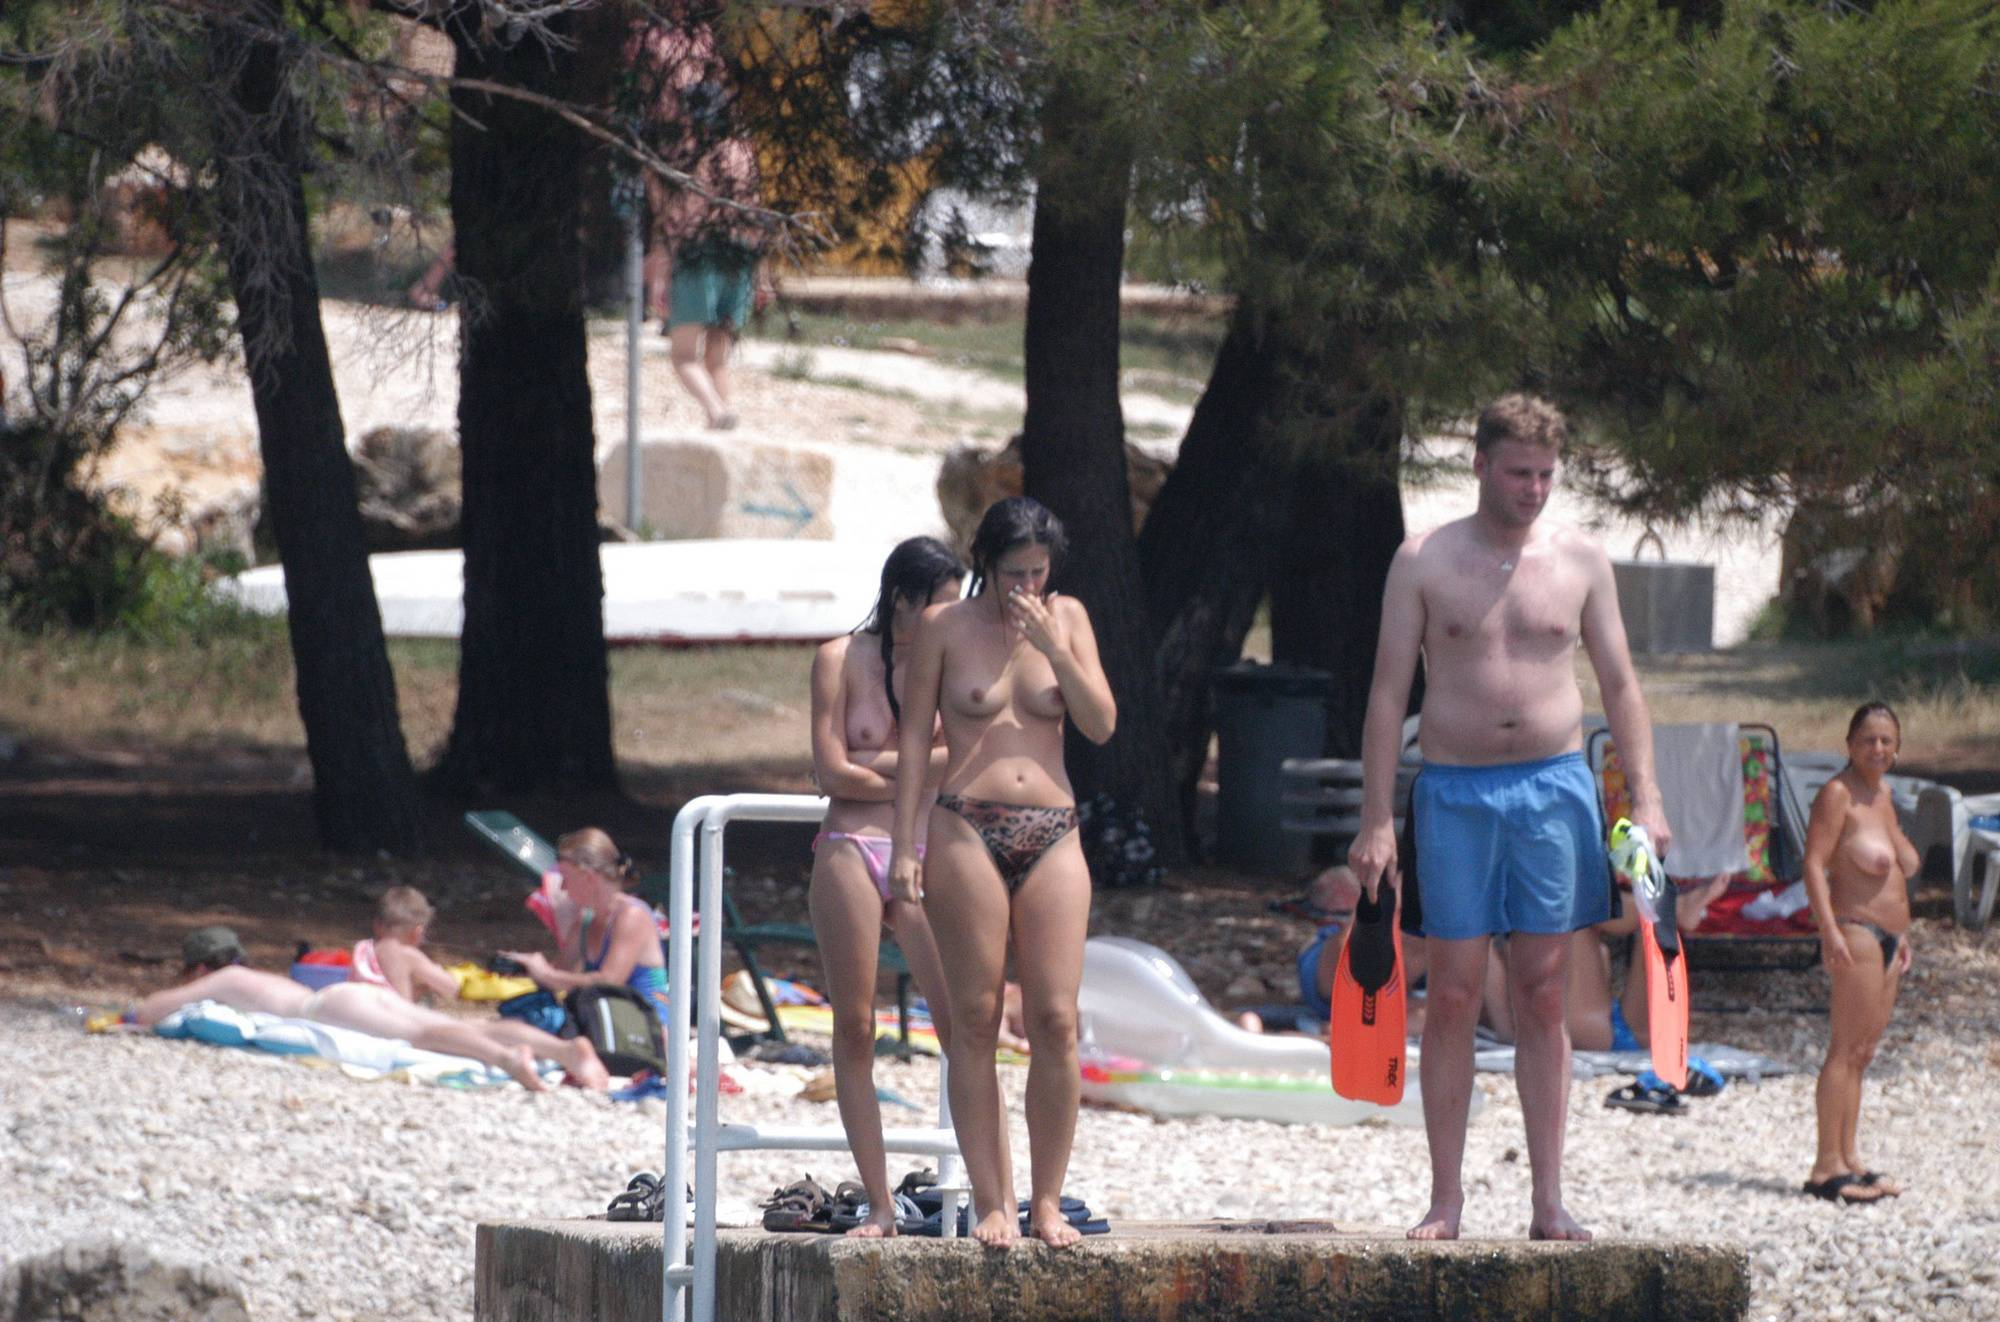 Nudist Gallery RovinJ Shoreline Tour - 2